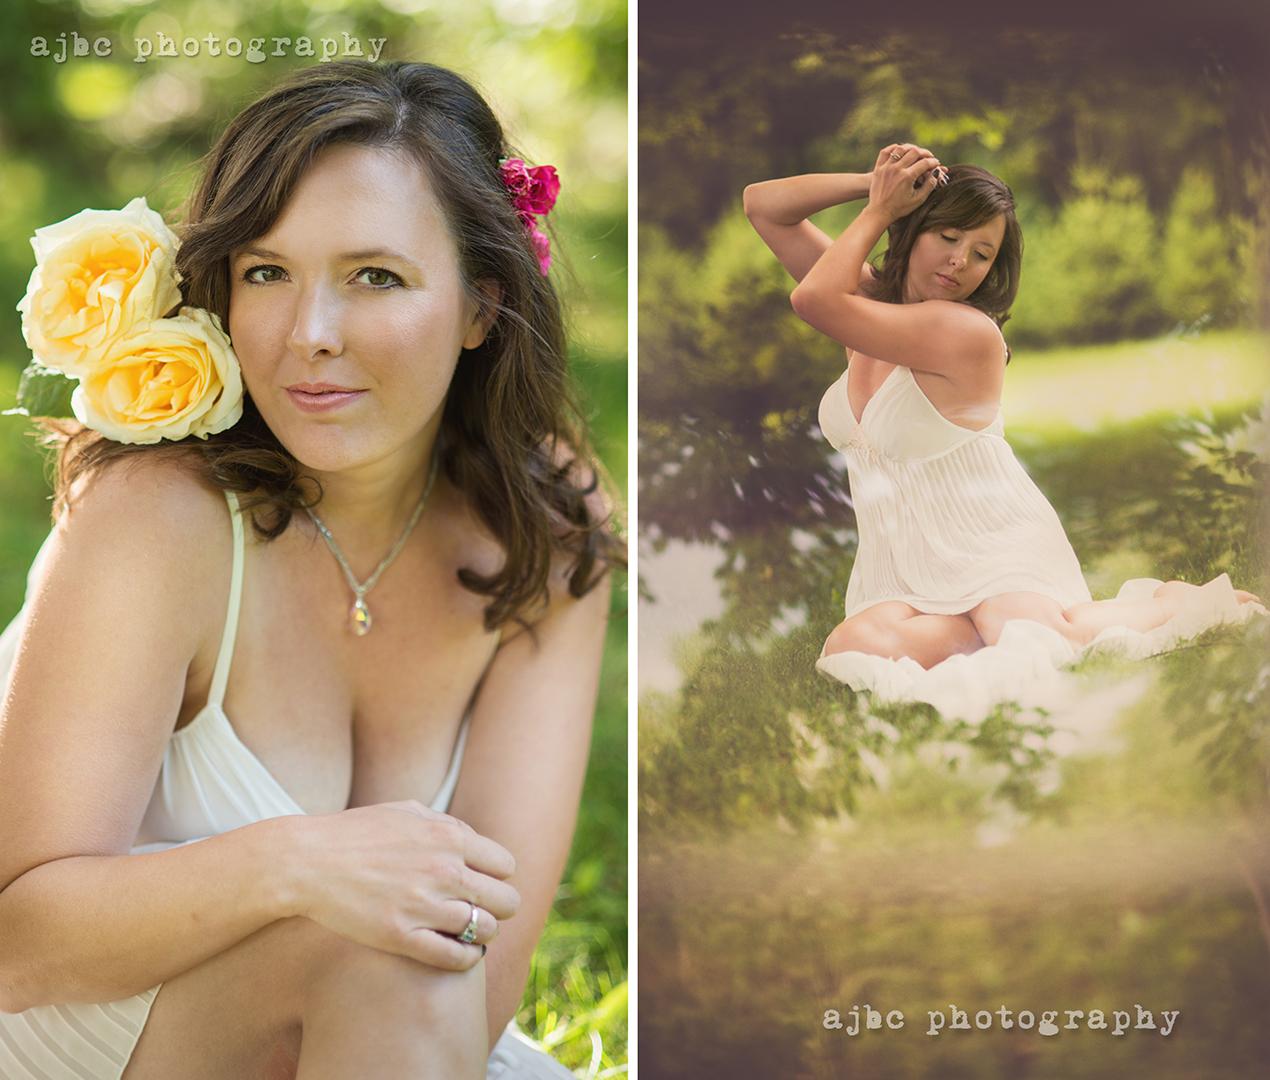 ajbcphotography_port huron_photographer_boudoir_beauty_flowers_outdoors